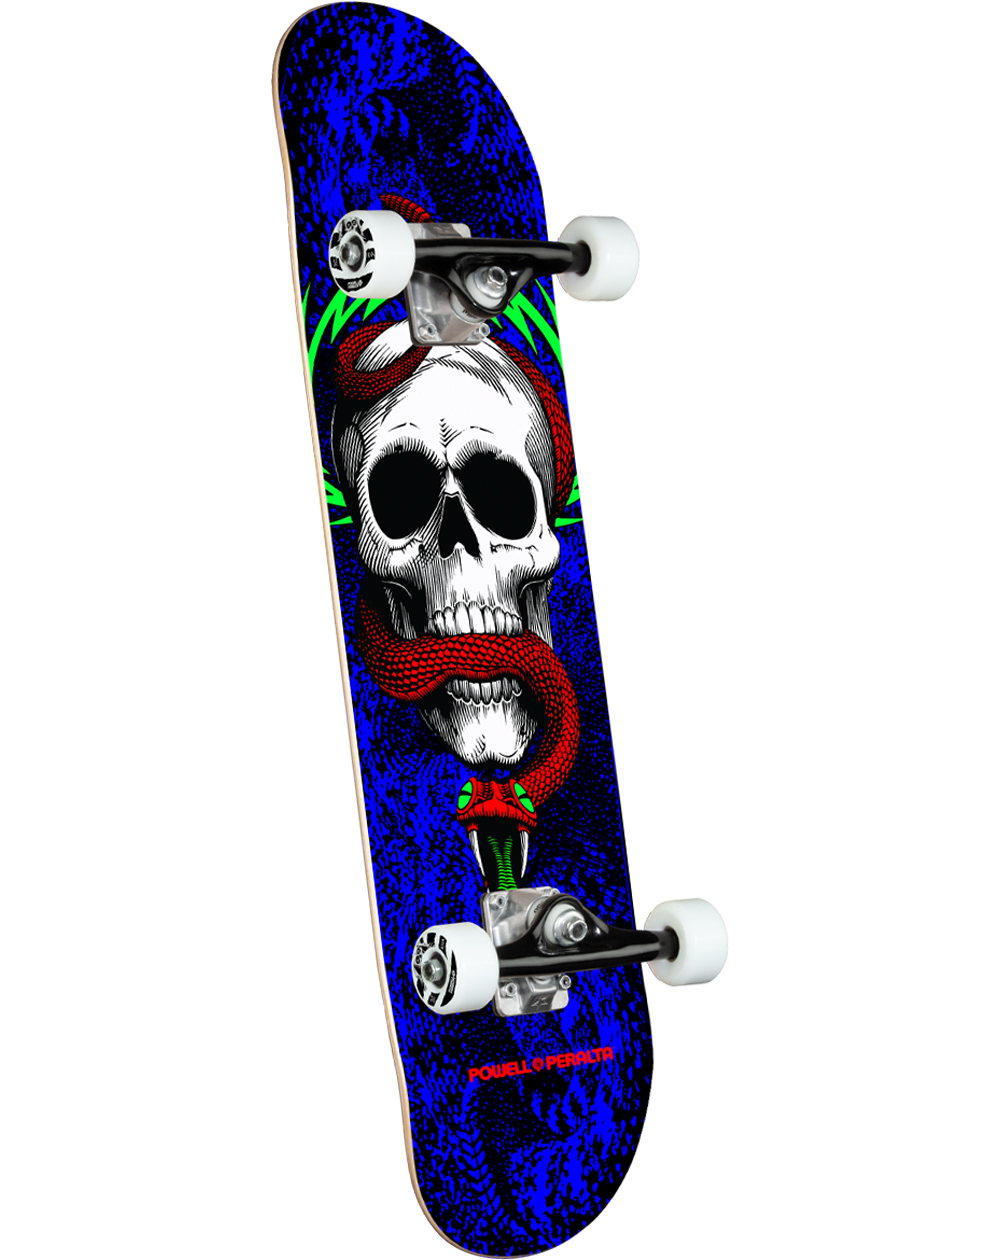 "Powell Peralta Skate Montado Skull & Snake 7.75"" Royal"